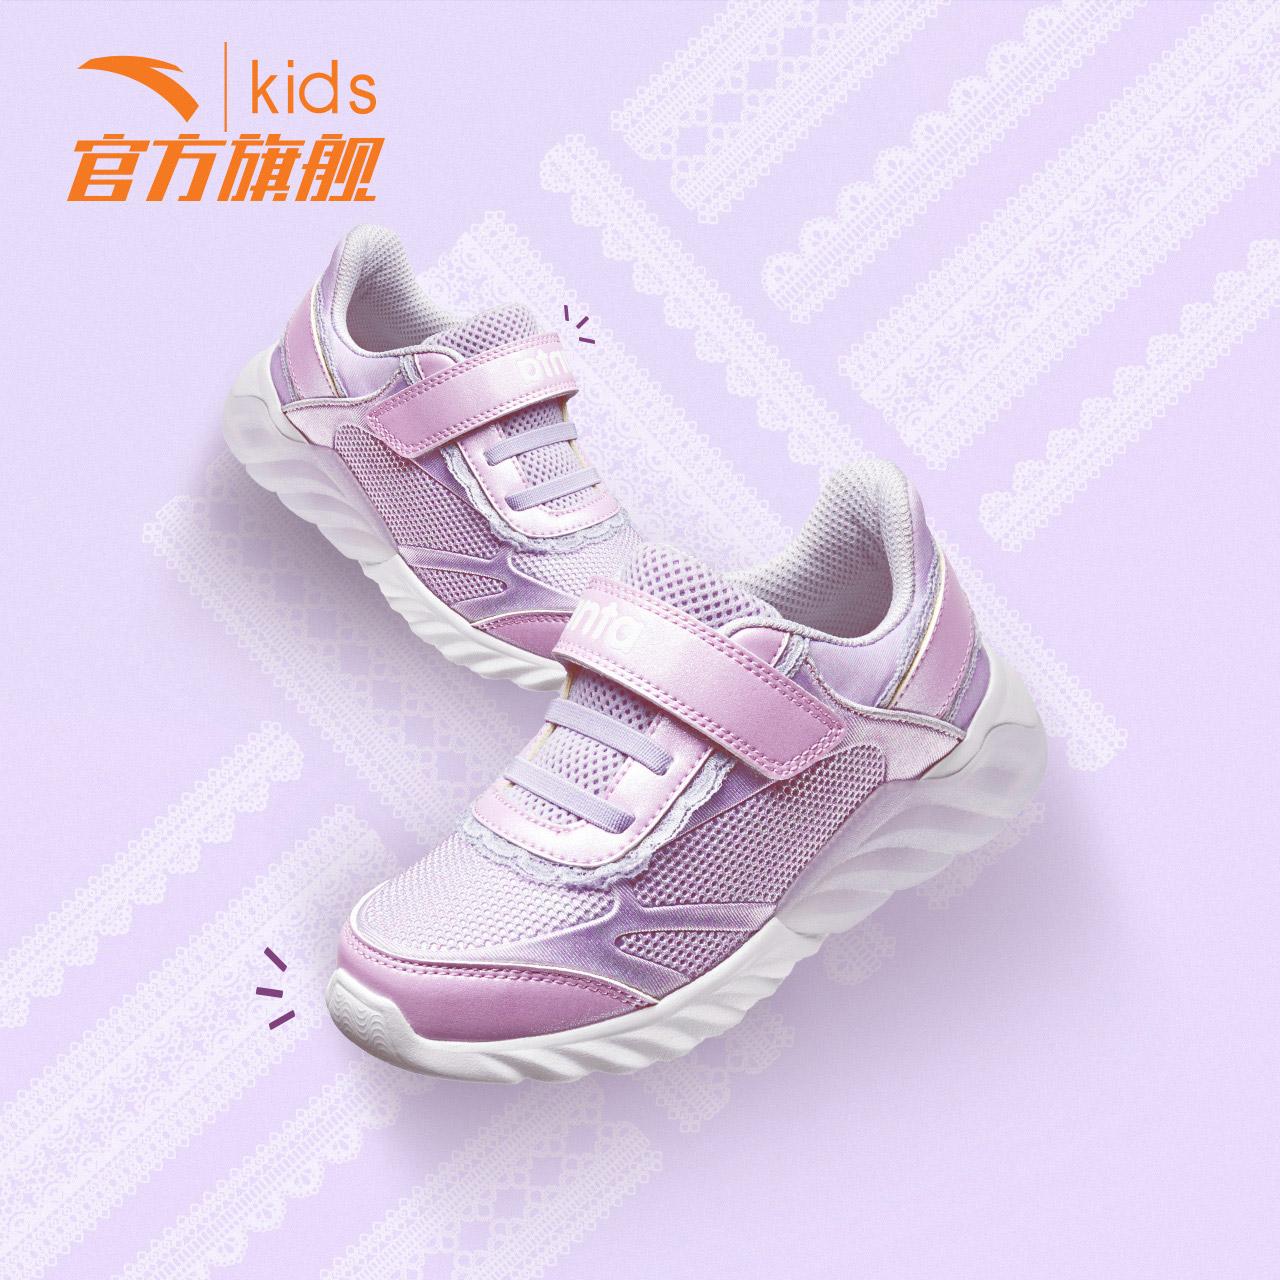 608cb3f31dbe Anta children s children Velcro running shoes 2019 spring new children s  sports shoes girls running shoes